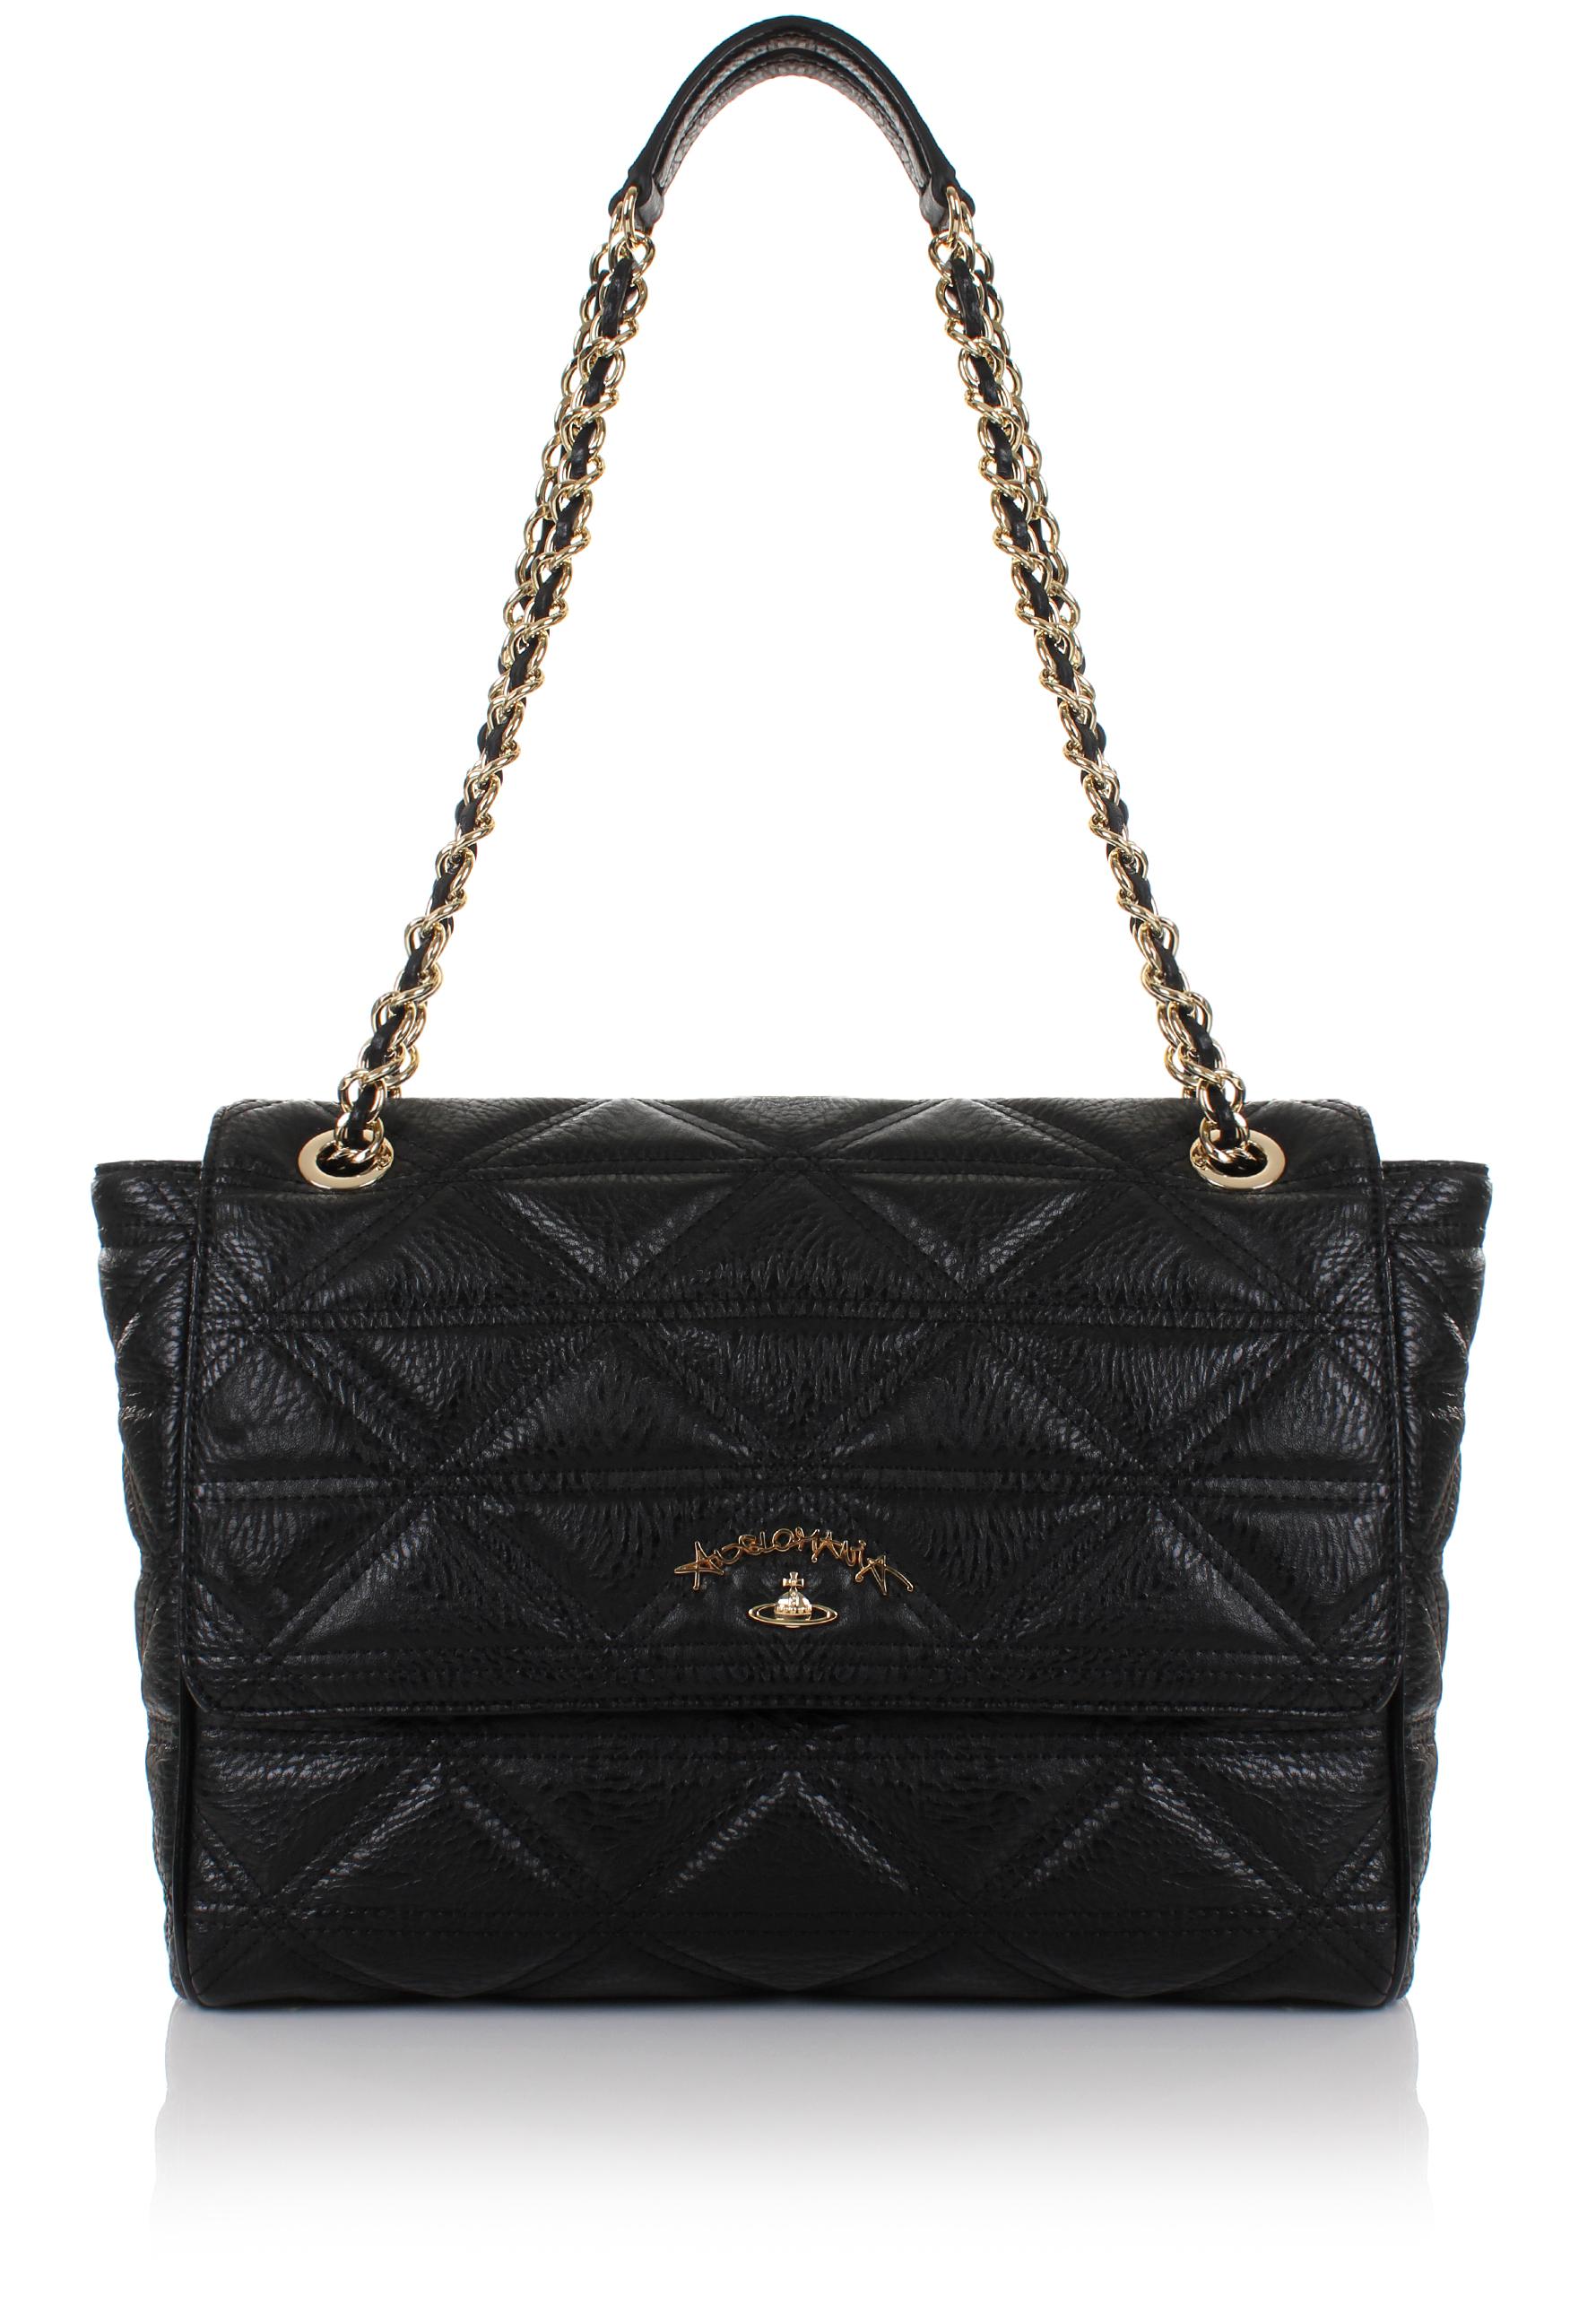 2af6685a9221 Vivienne Westwood Sharlenemania 7050 Large Quilted Bag With Flap ...